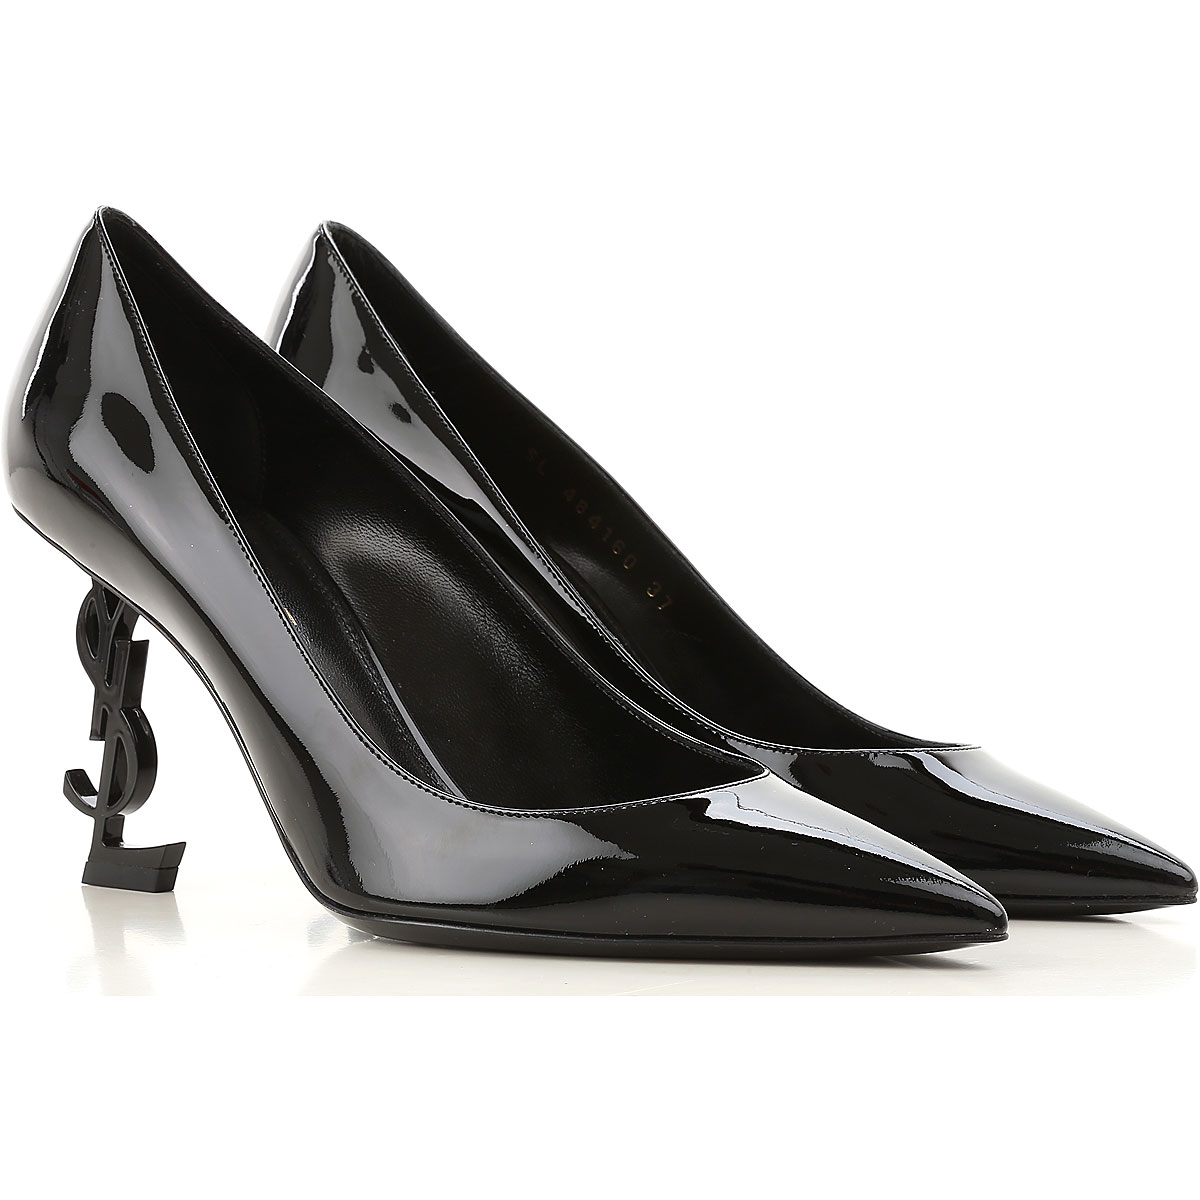 b7b468fa Womens Shoes Yves Saint Laurent, Style code: 484160-0npvv-1000